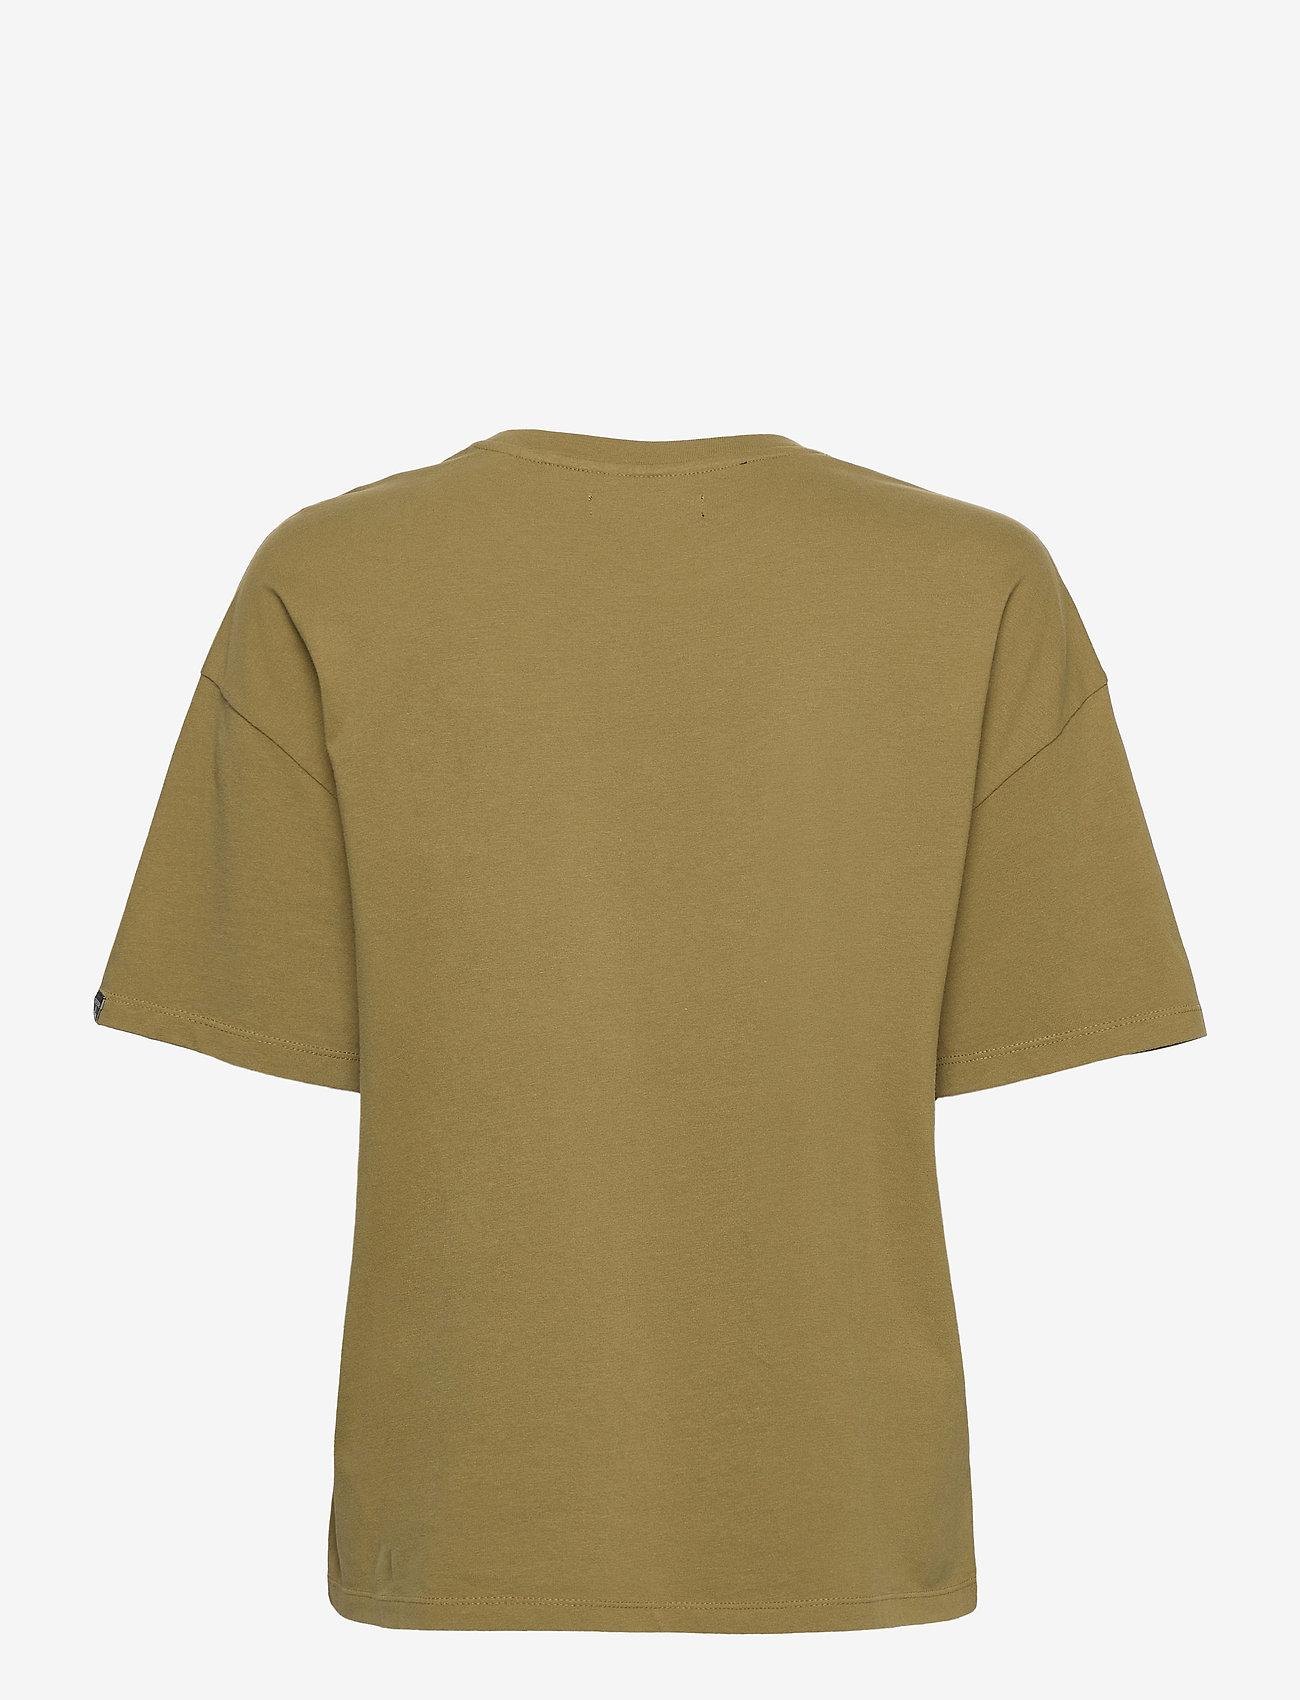 Superdry - MILITARY NARRATIVE BOXY TEE - t-shirts - shrubbery - 1